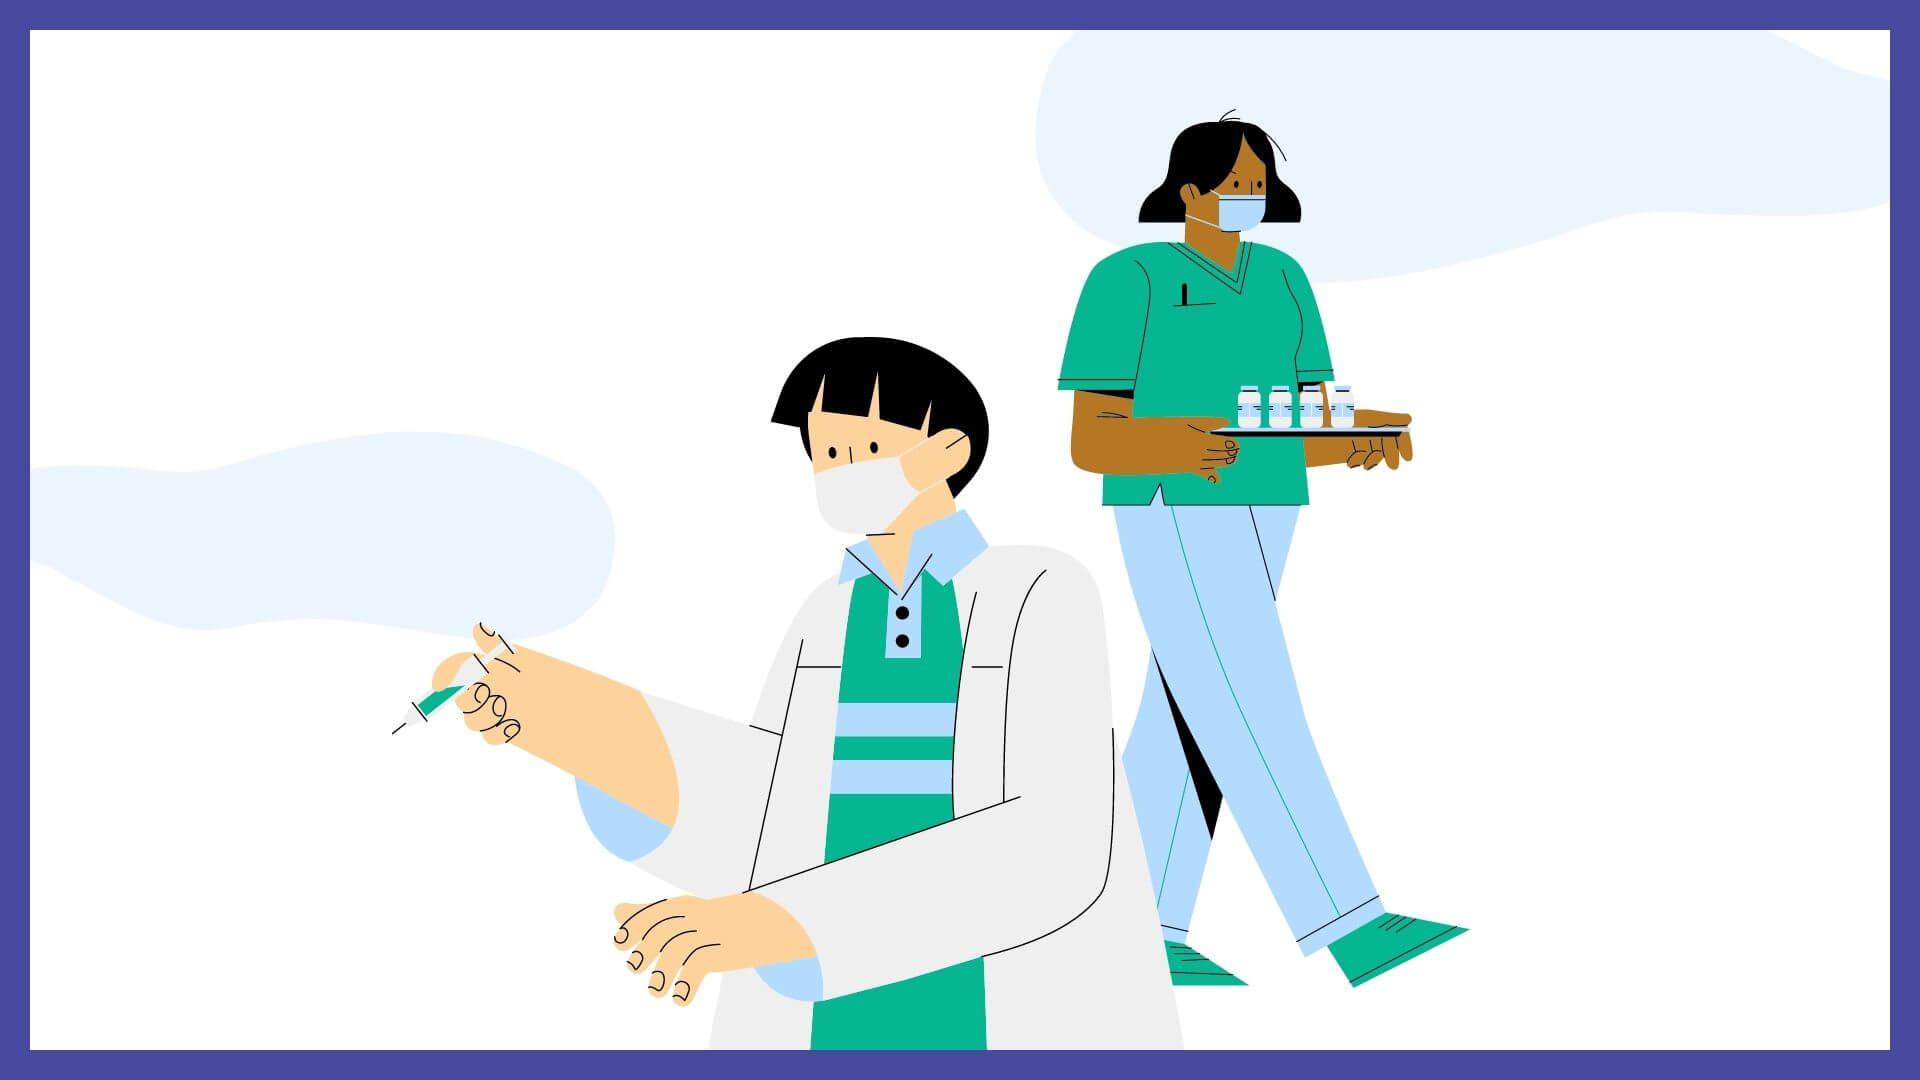 COVID-19 Vaccine Event - illustration of two health care professionals